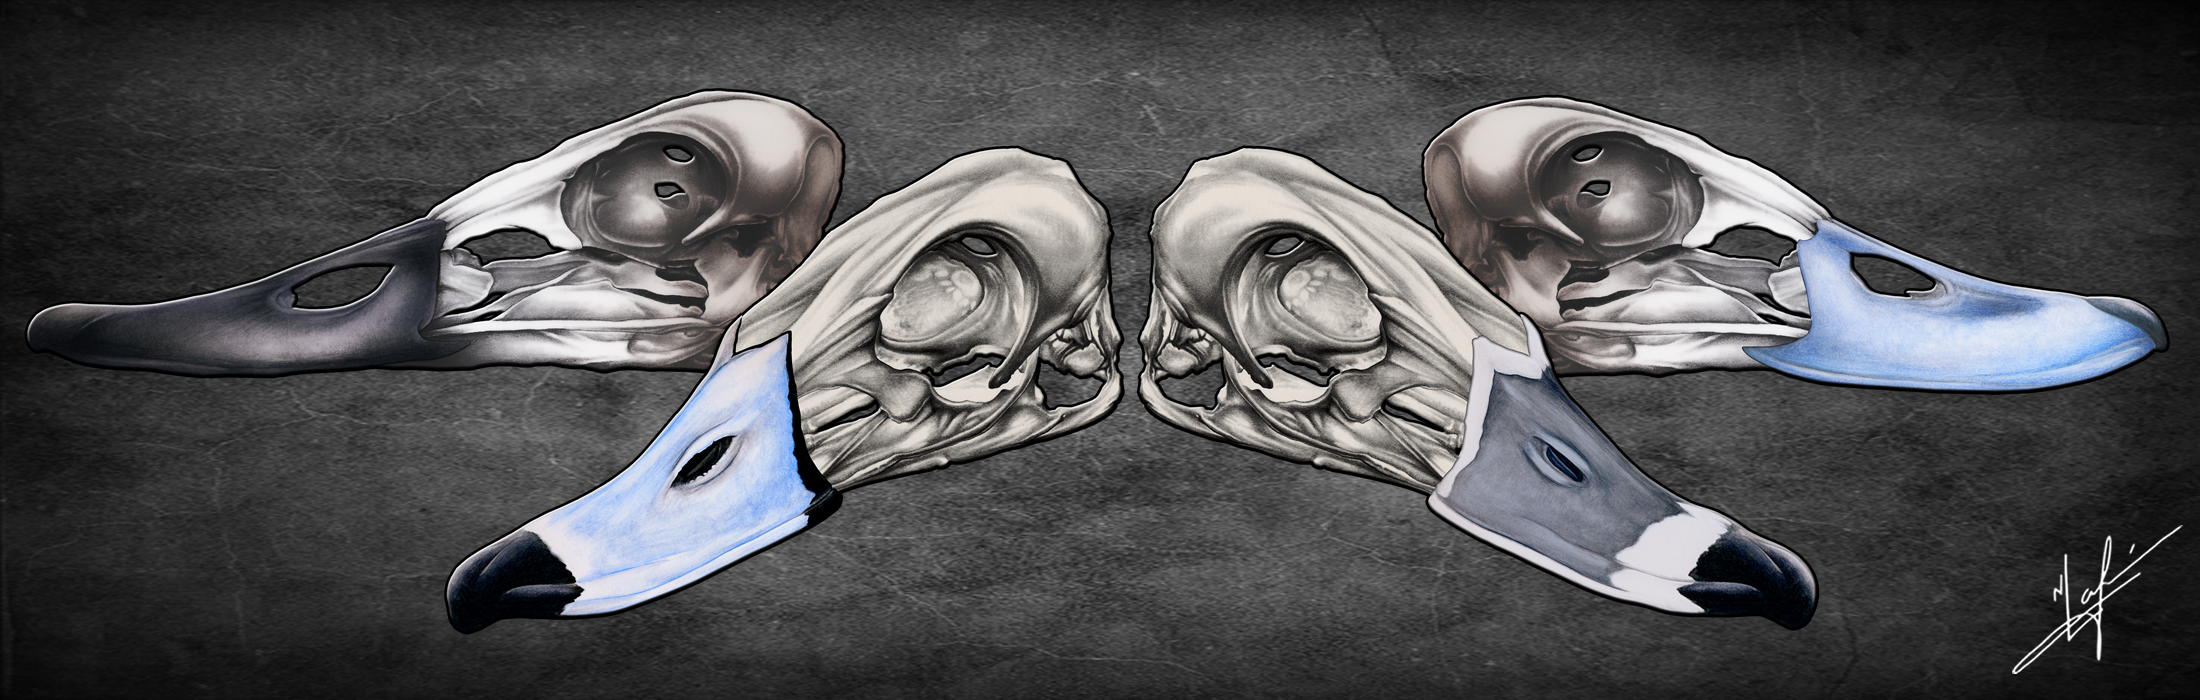 Diver Duck Skulls